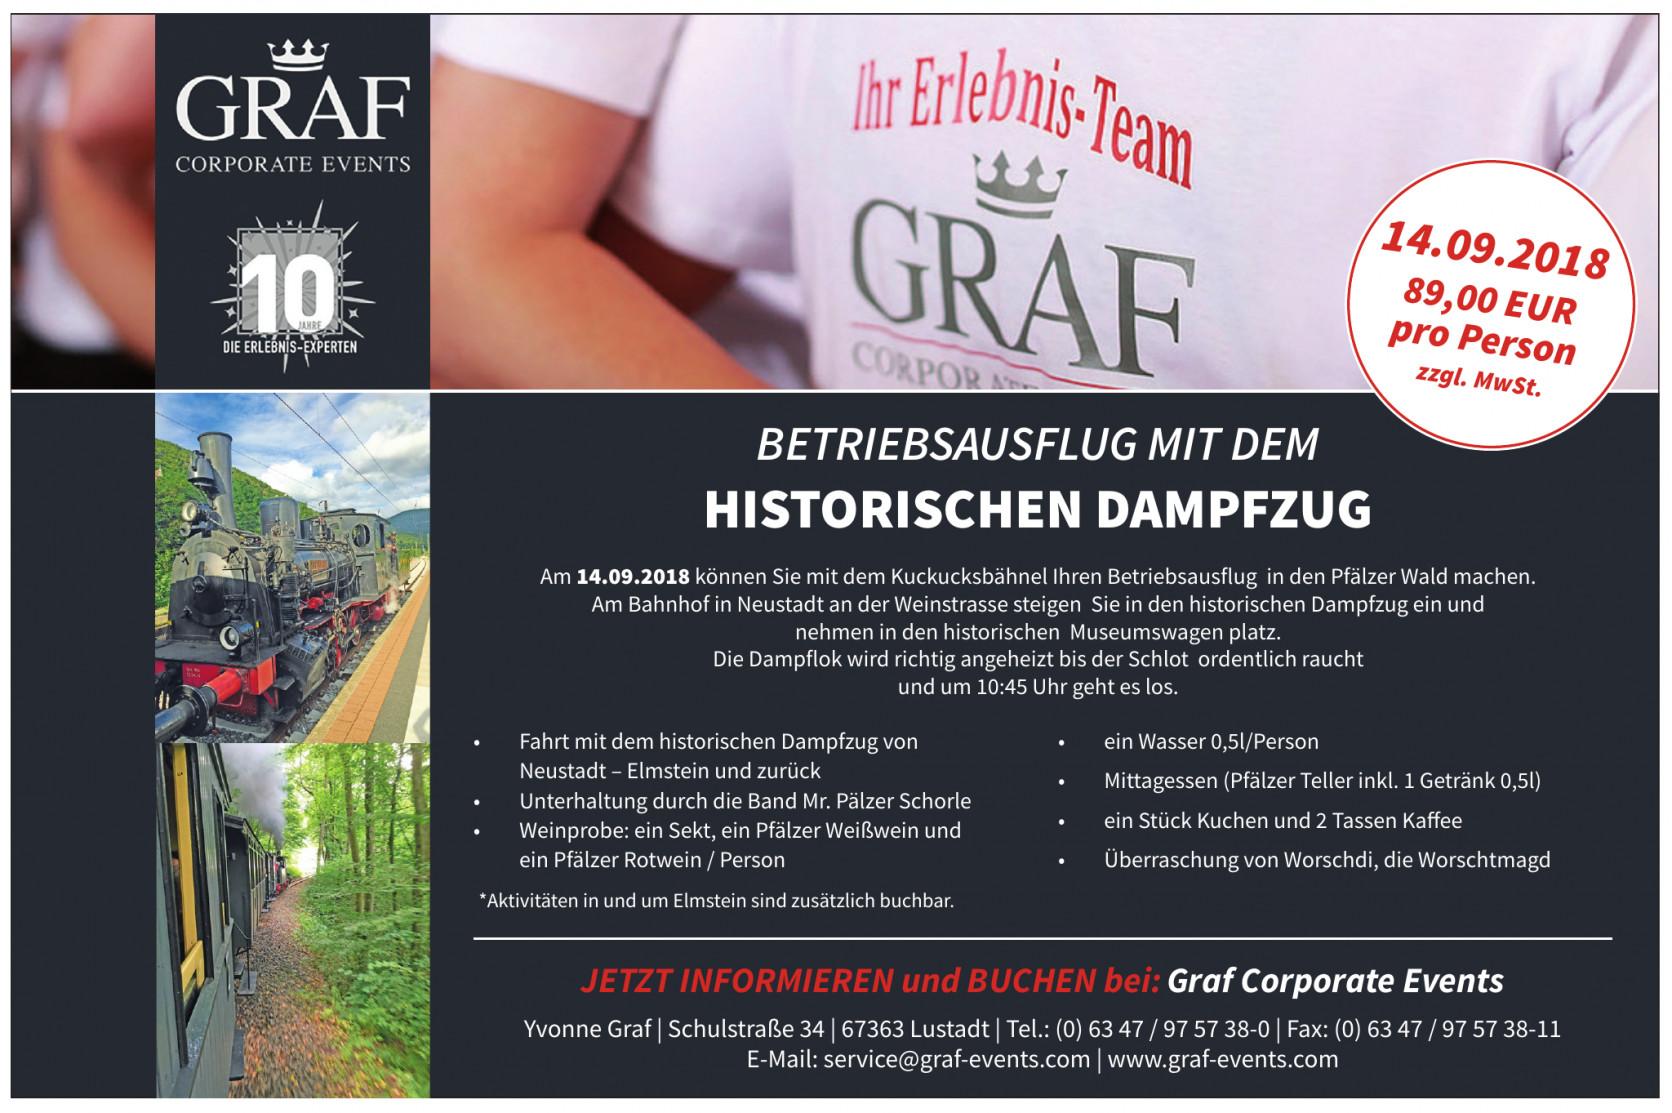 Graf Corporate Events